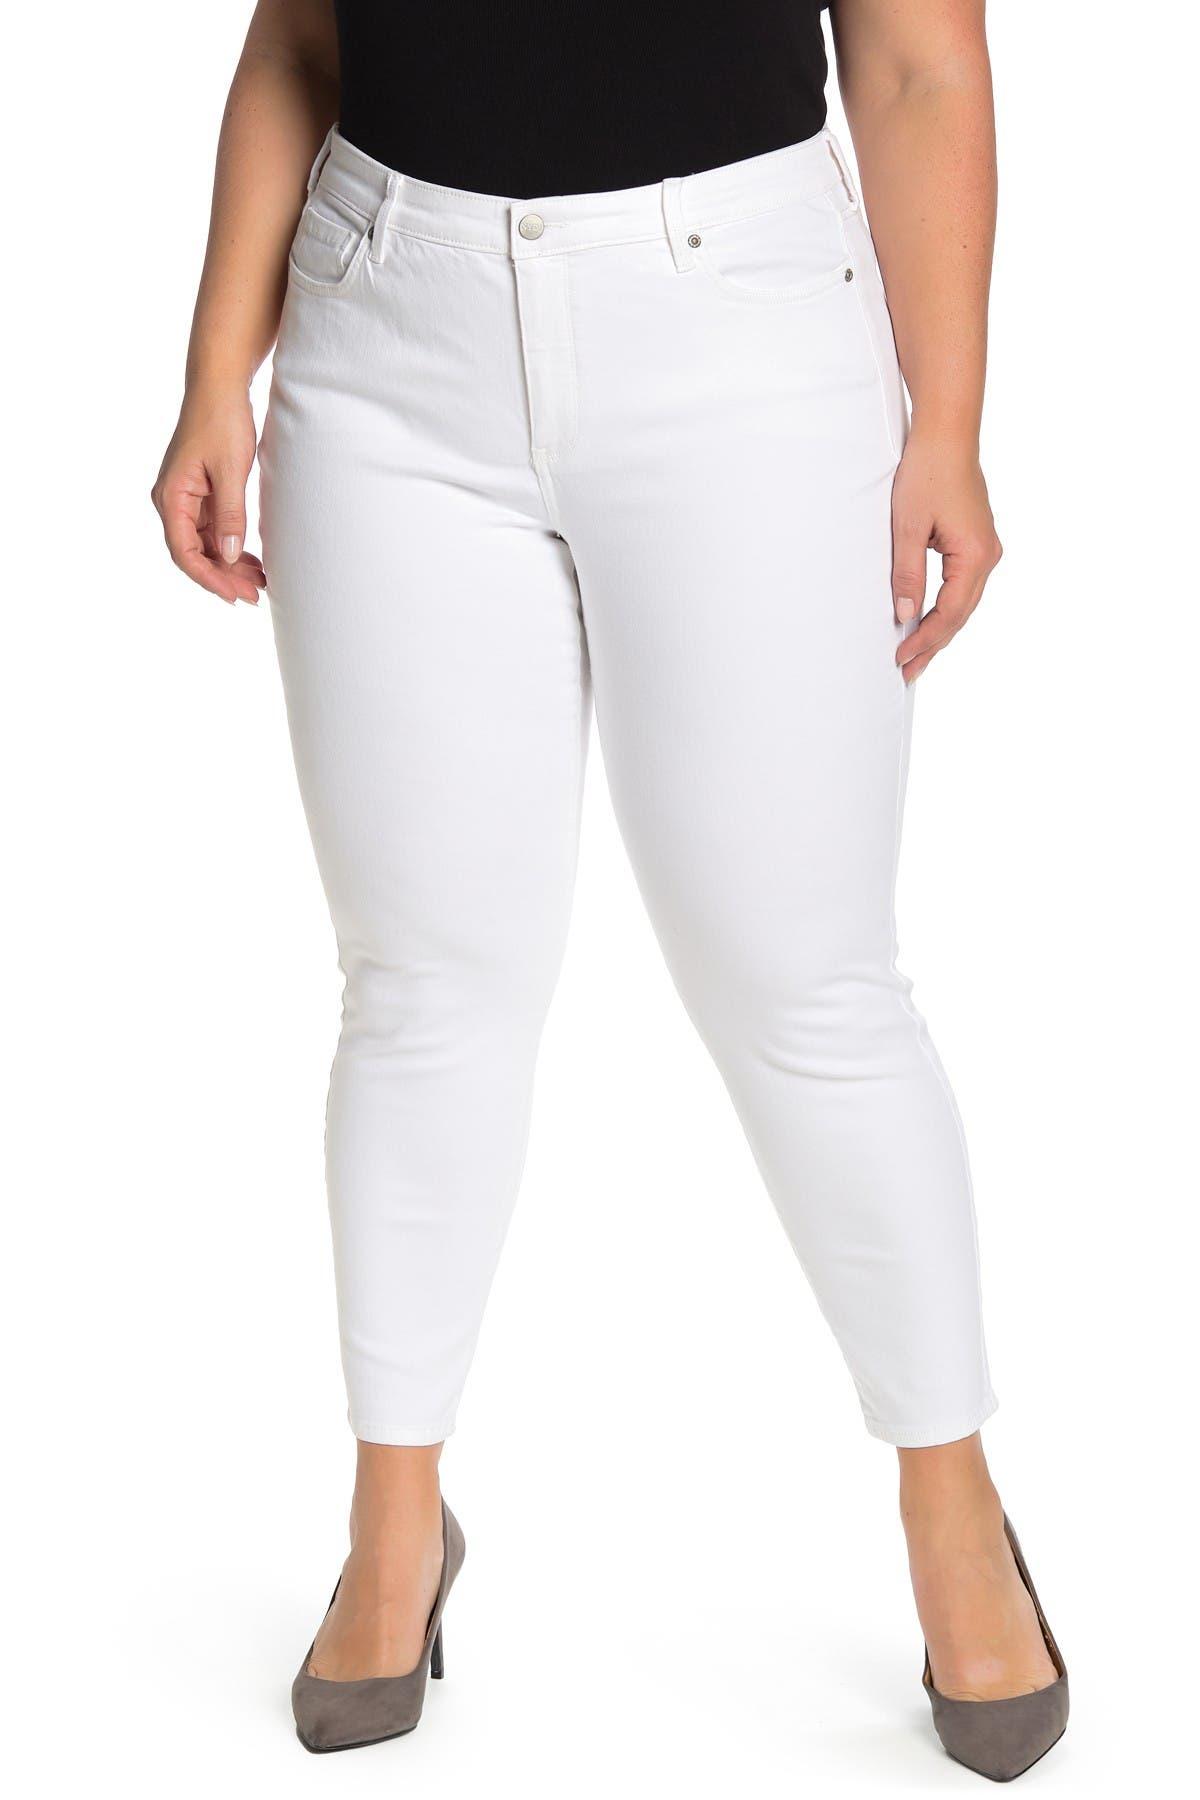 Image of NYDJ Ami Ankle Crop Skinny Jeans